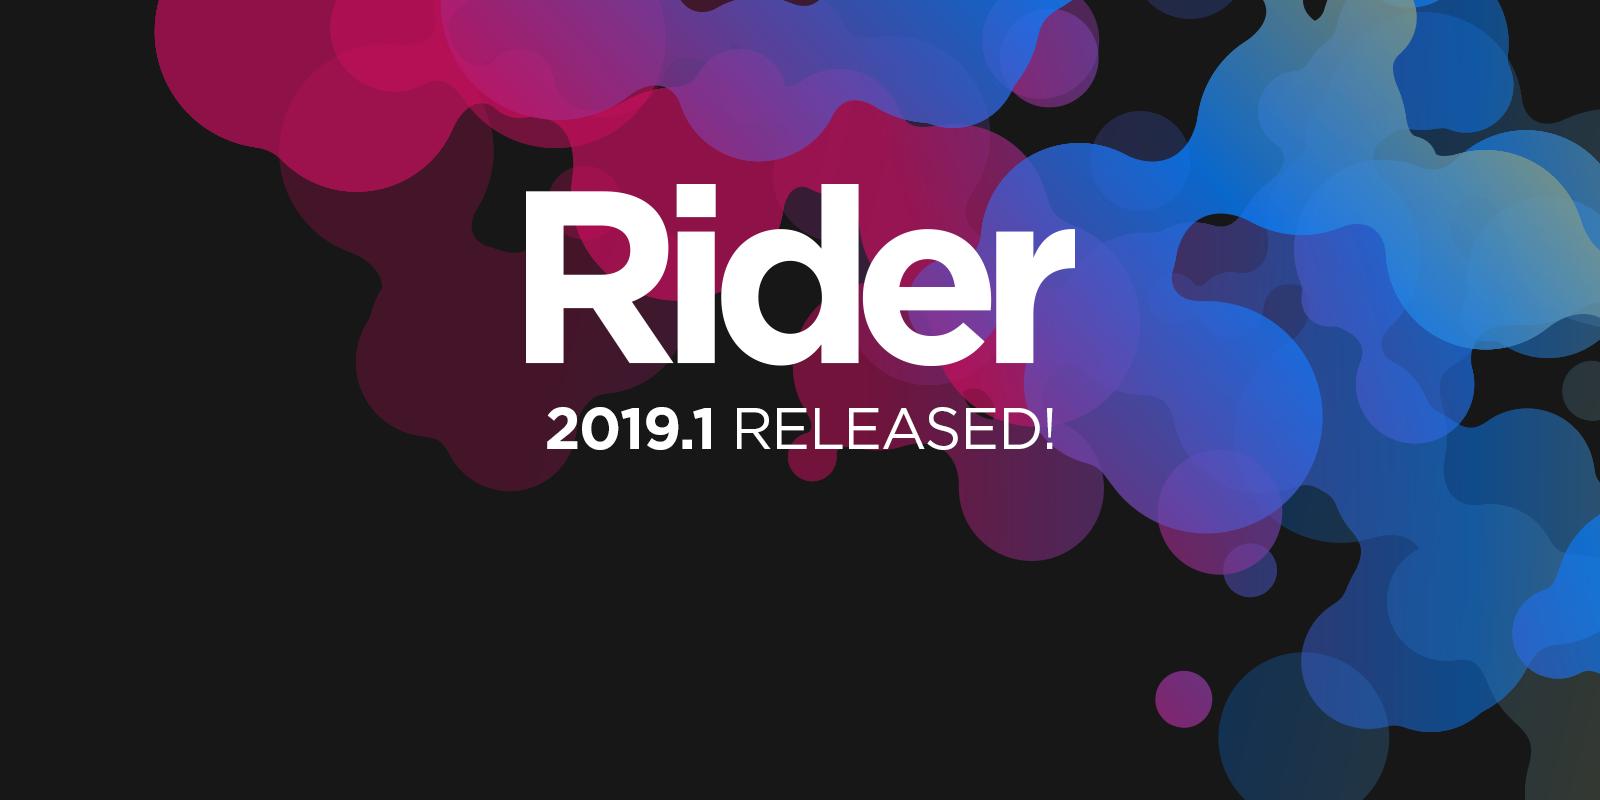 Rider 2019.1 est disponible